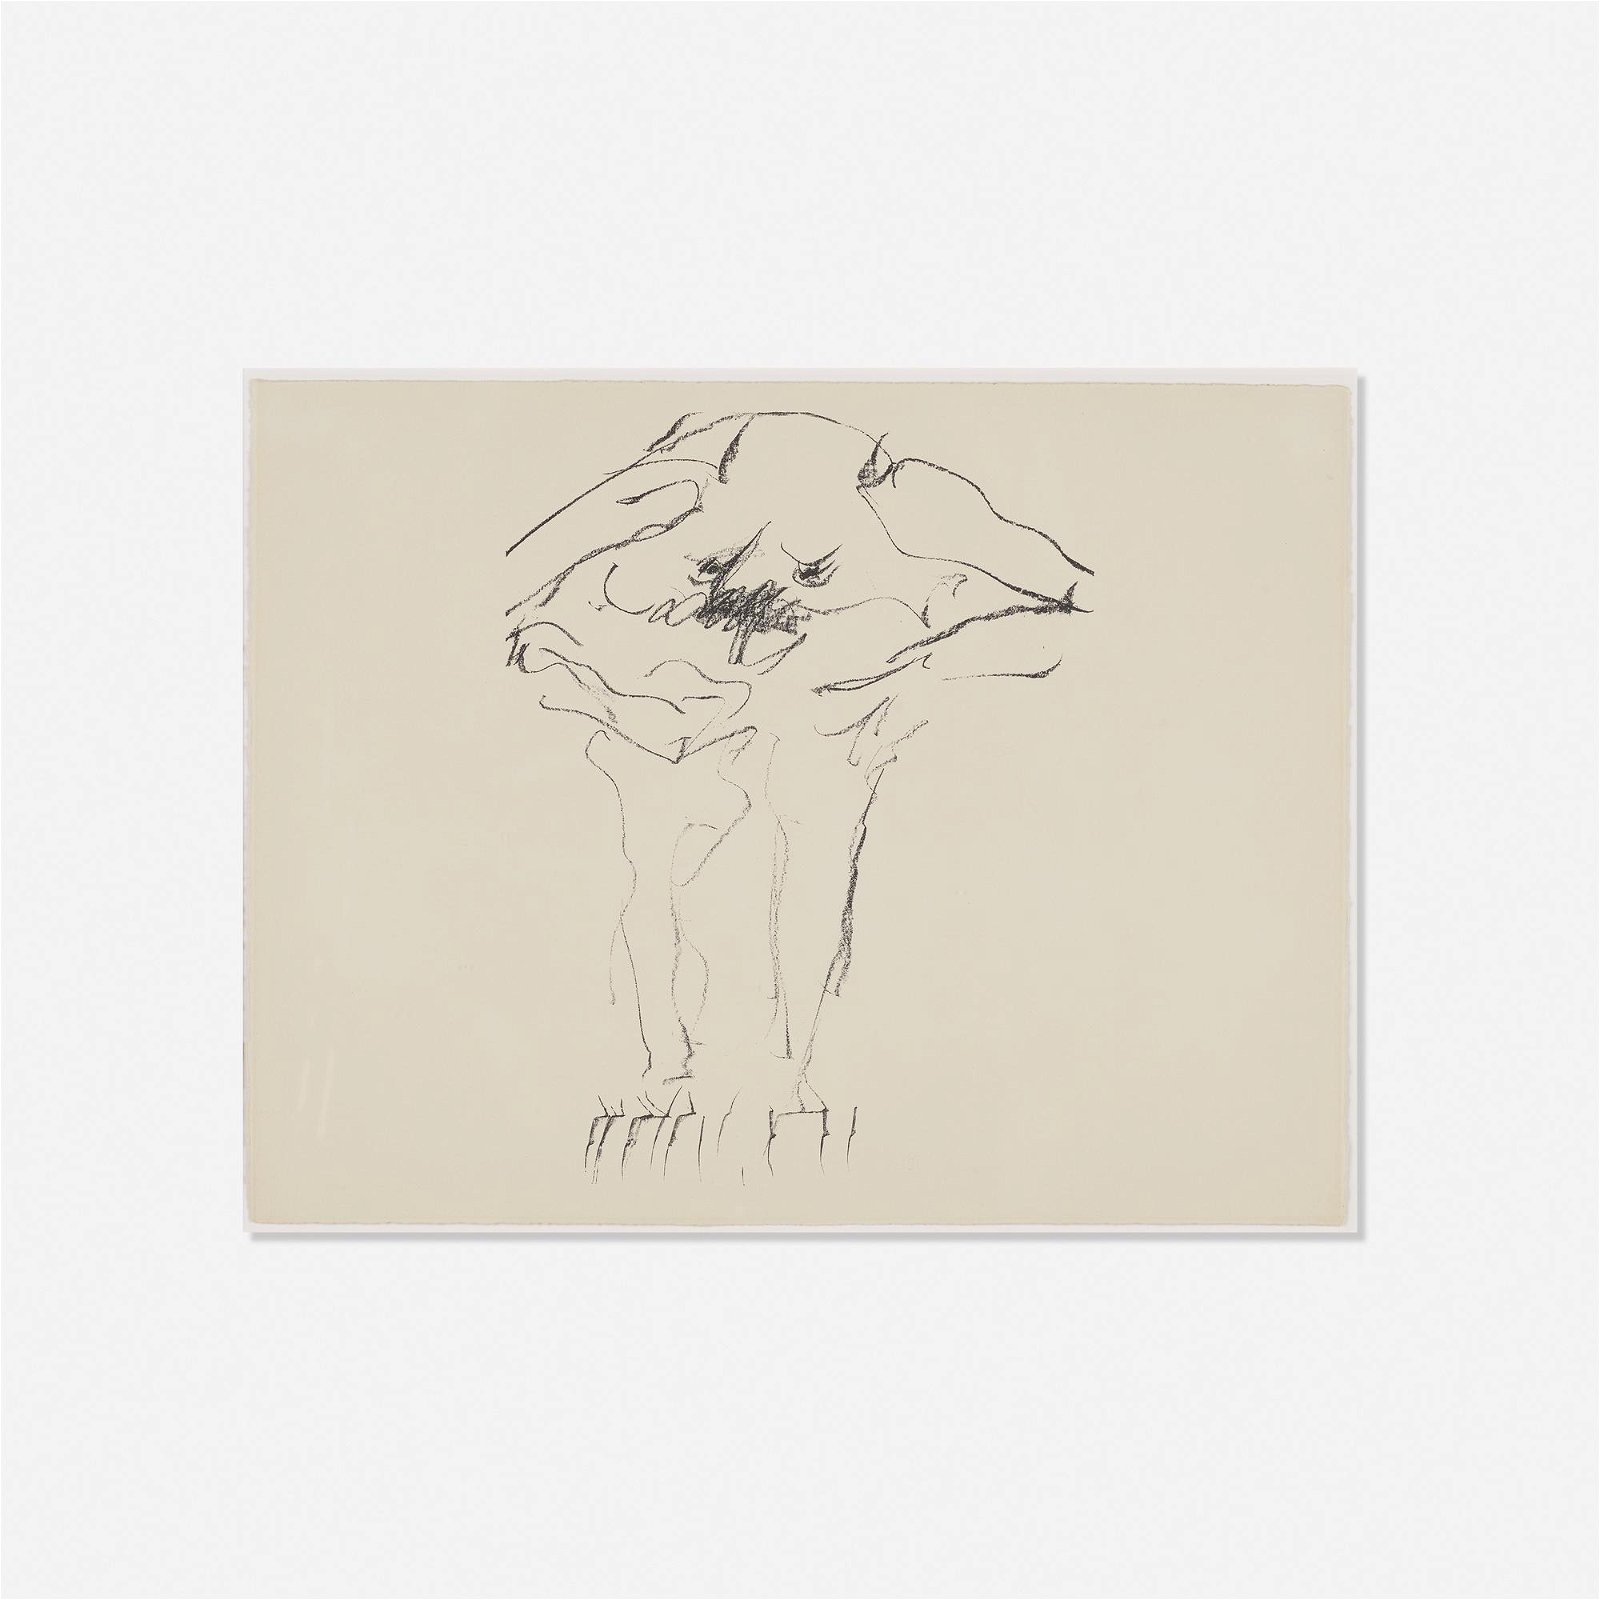 Willem de Kooning, Clam Digger from Portfolio 9